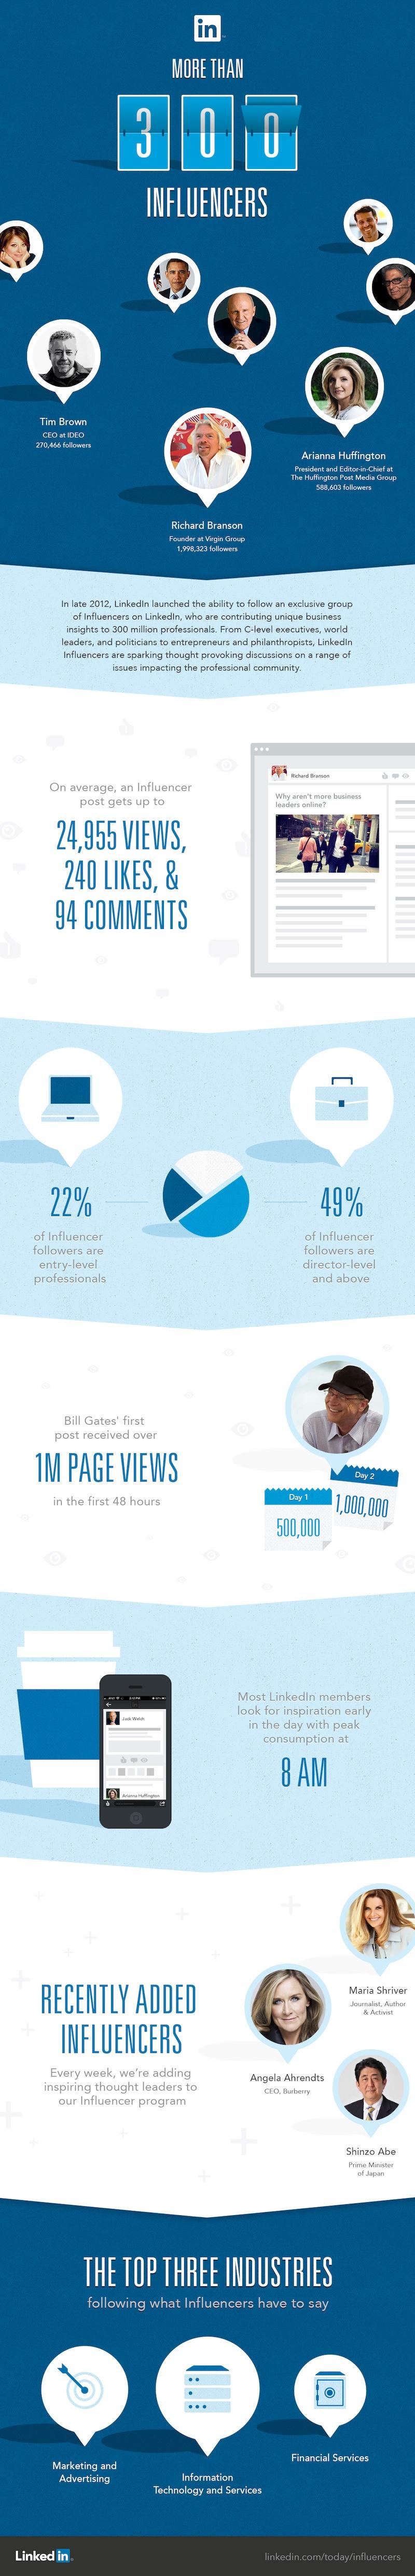 300 LinkedIn Influencers Infographic